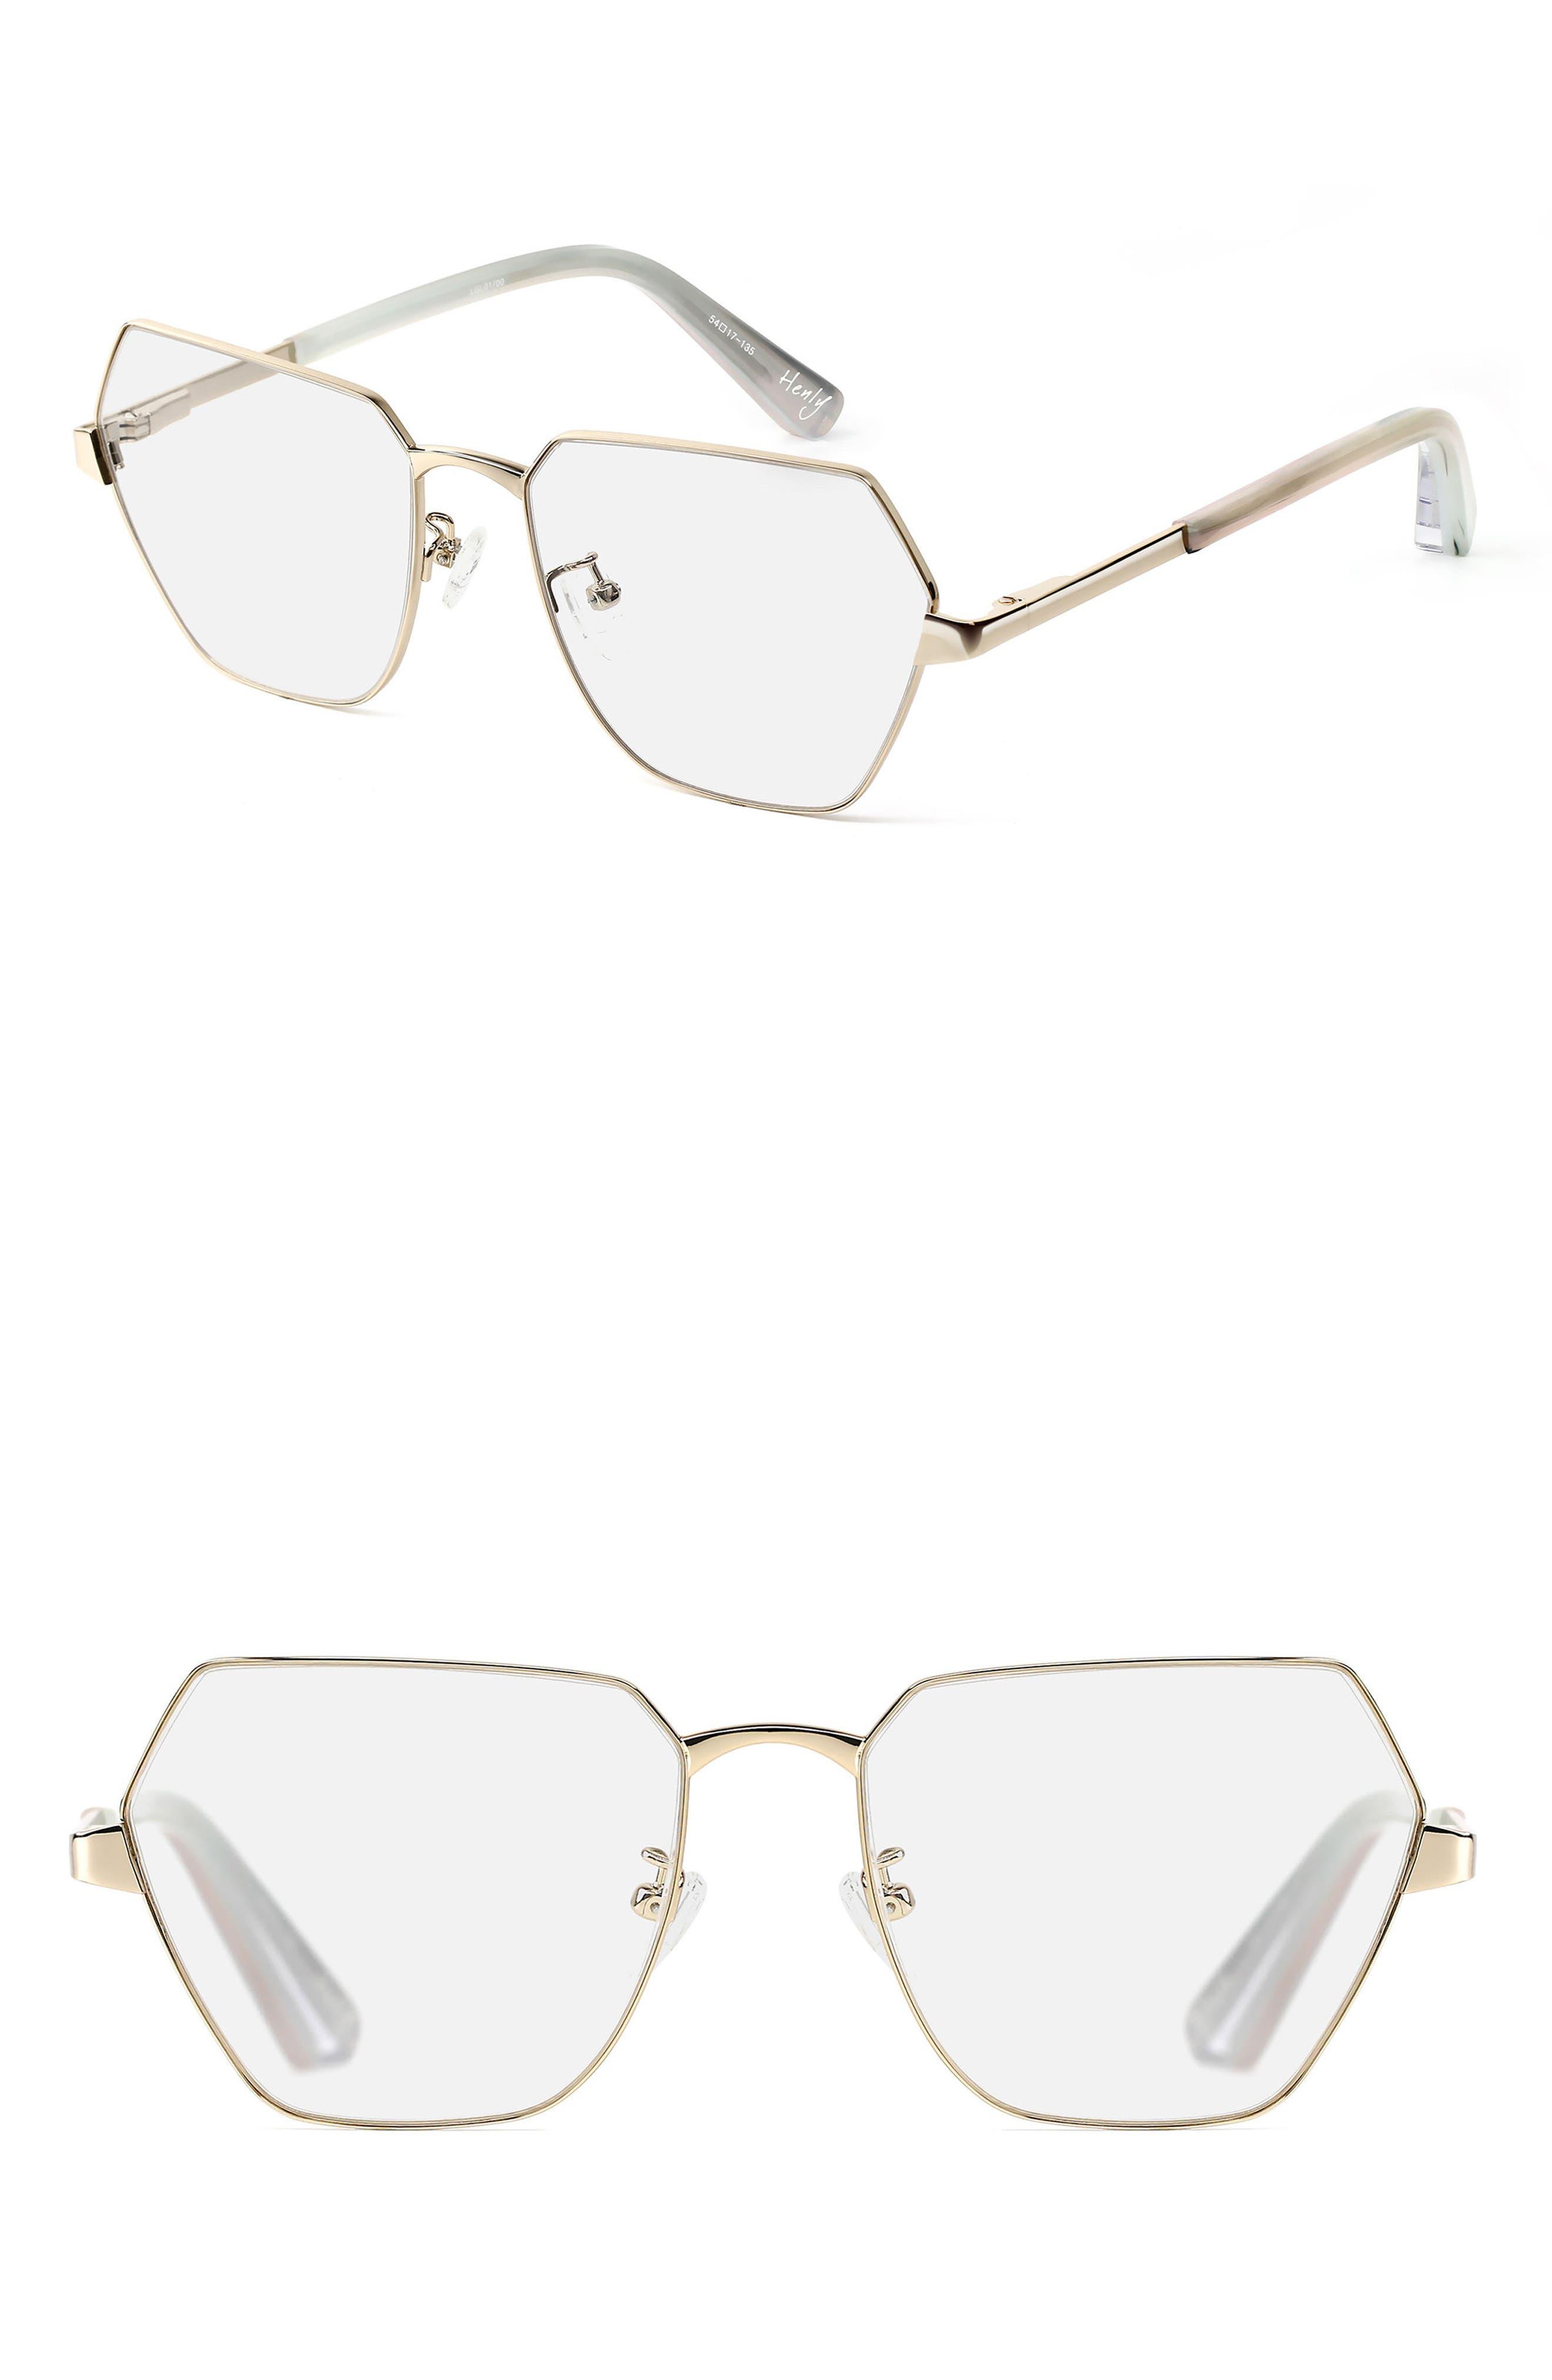 Henly 54mm Optical Glasses,                         Main,                         color, Light Gold